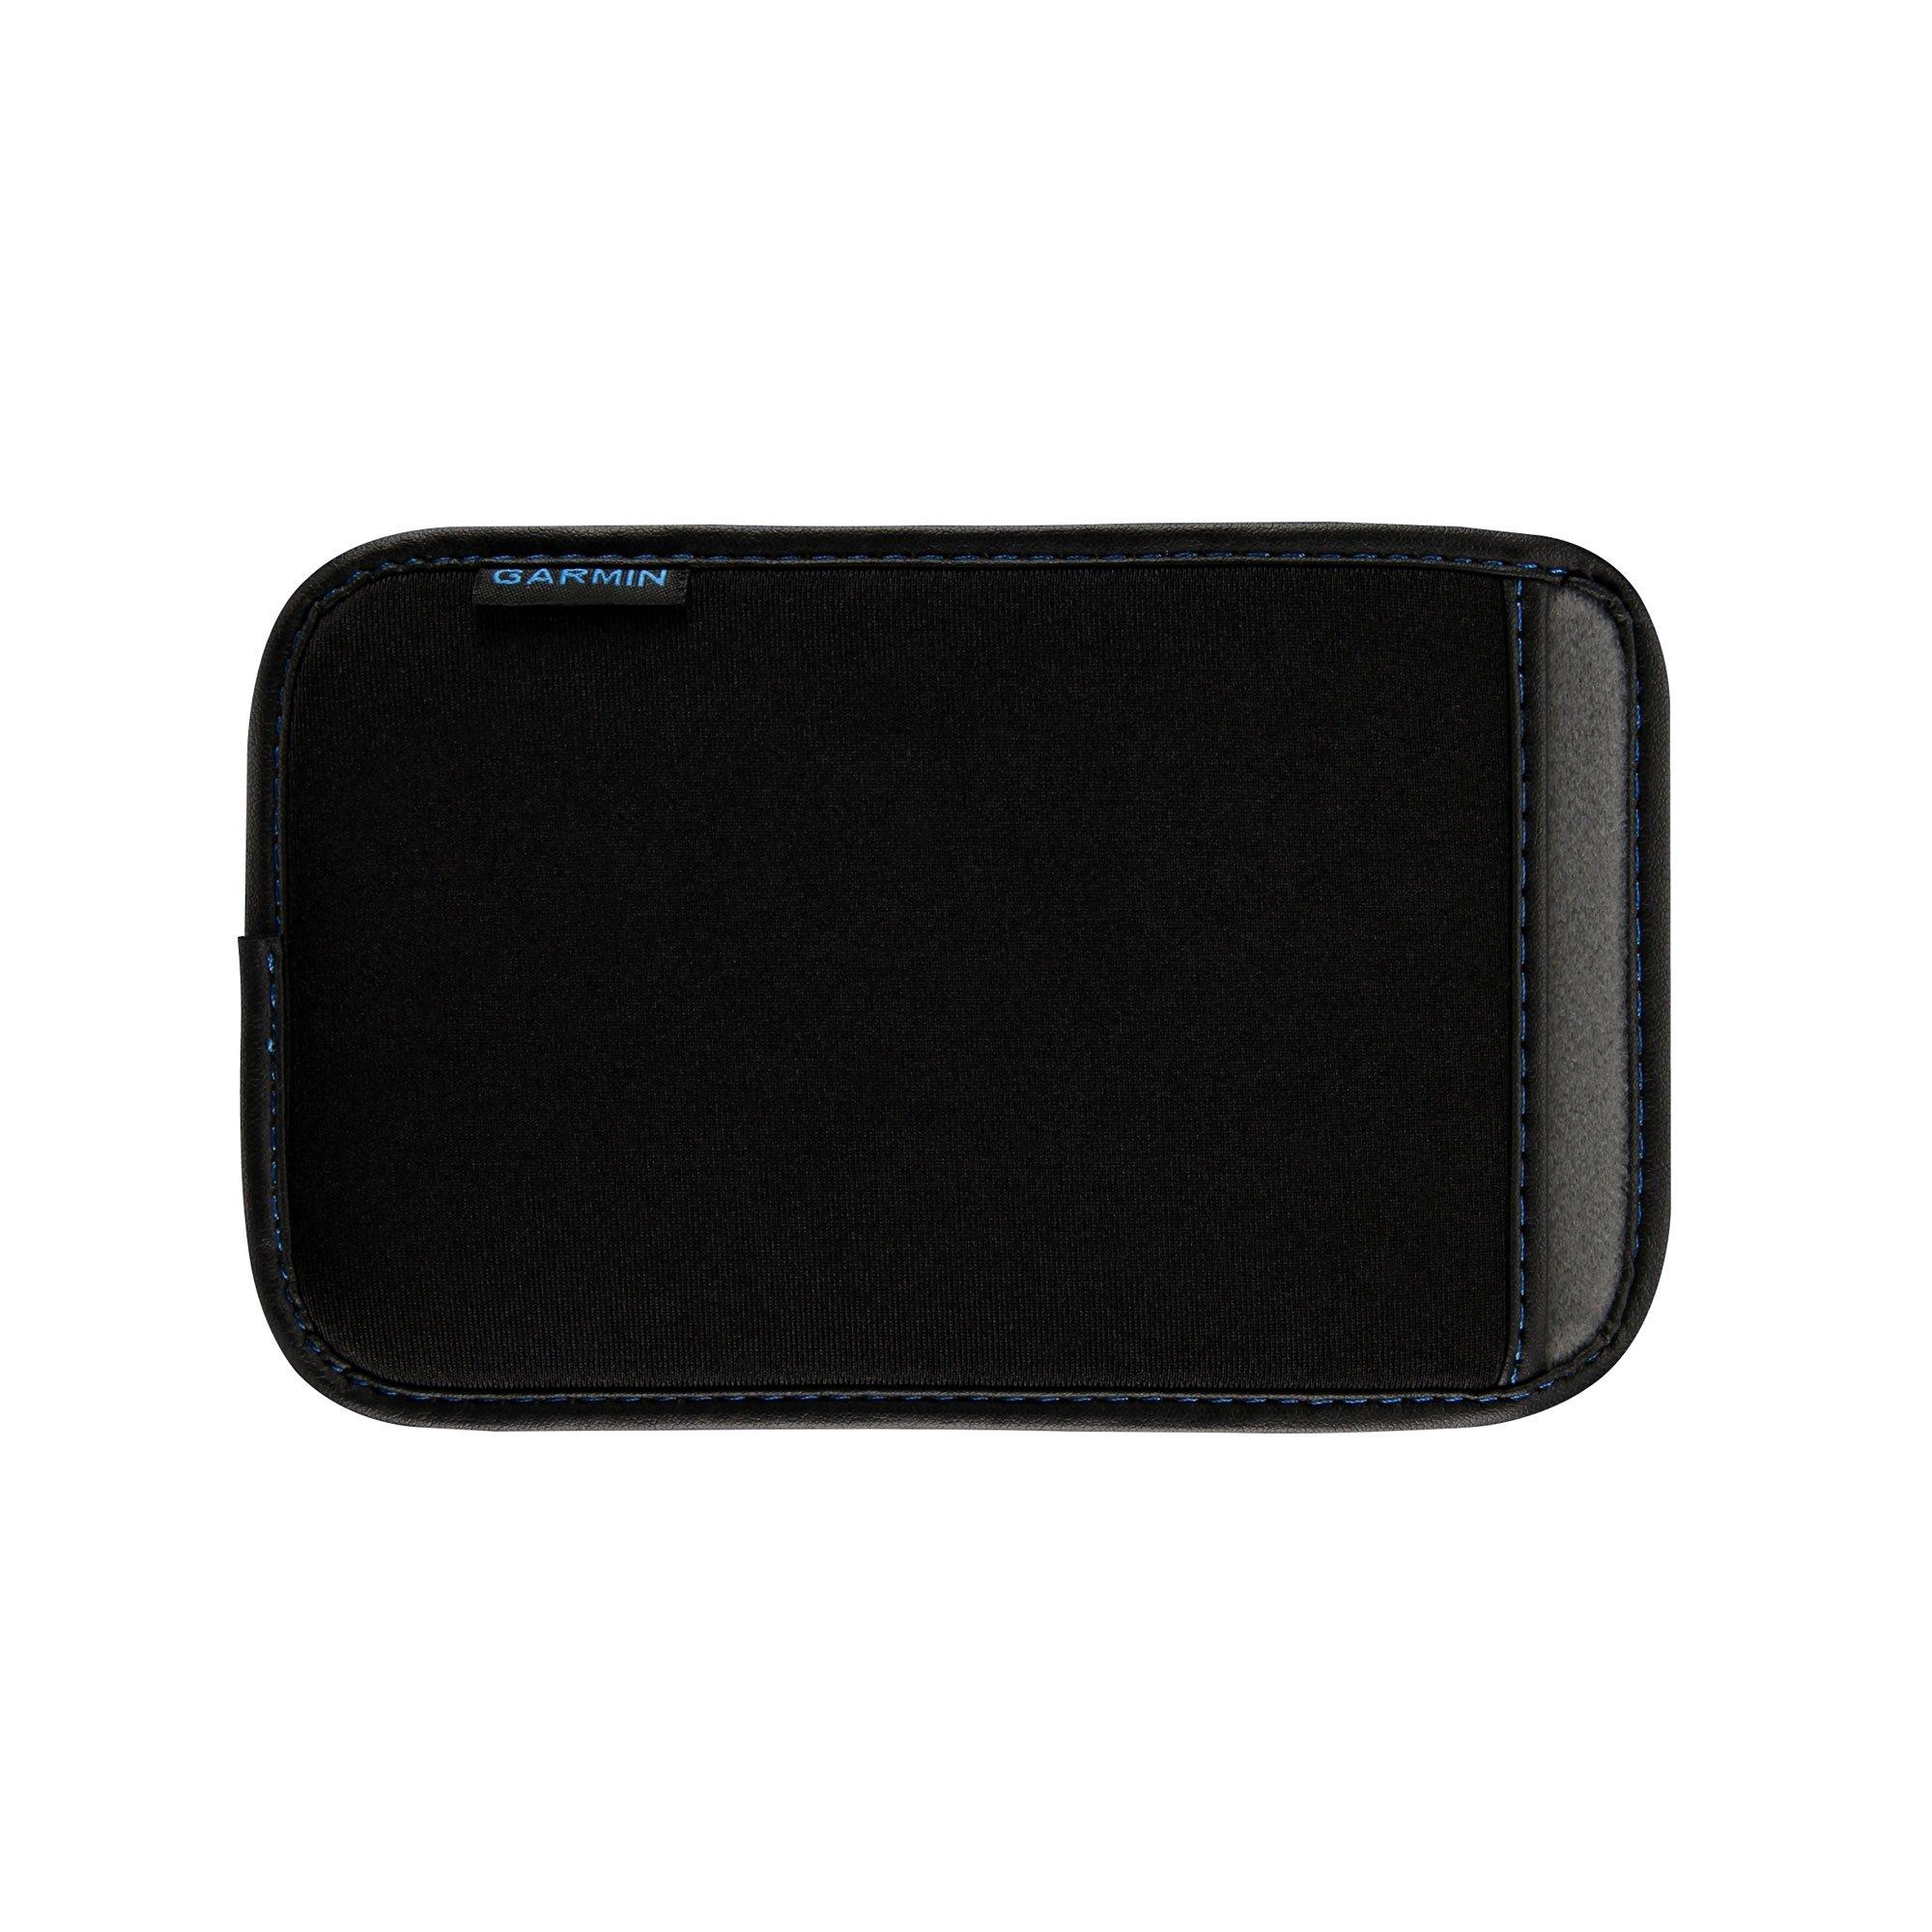 Garmin Universal 5-Inch Soft Carrying Case